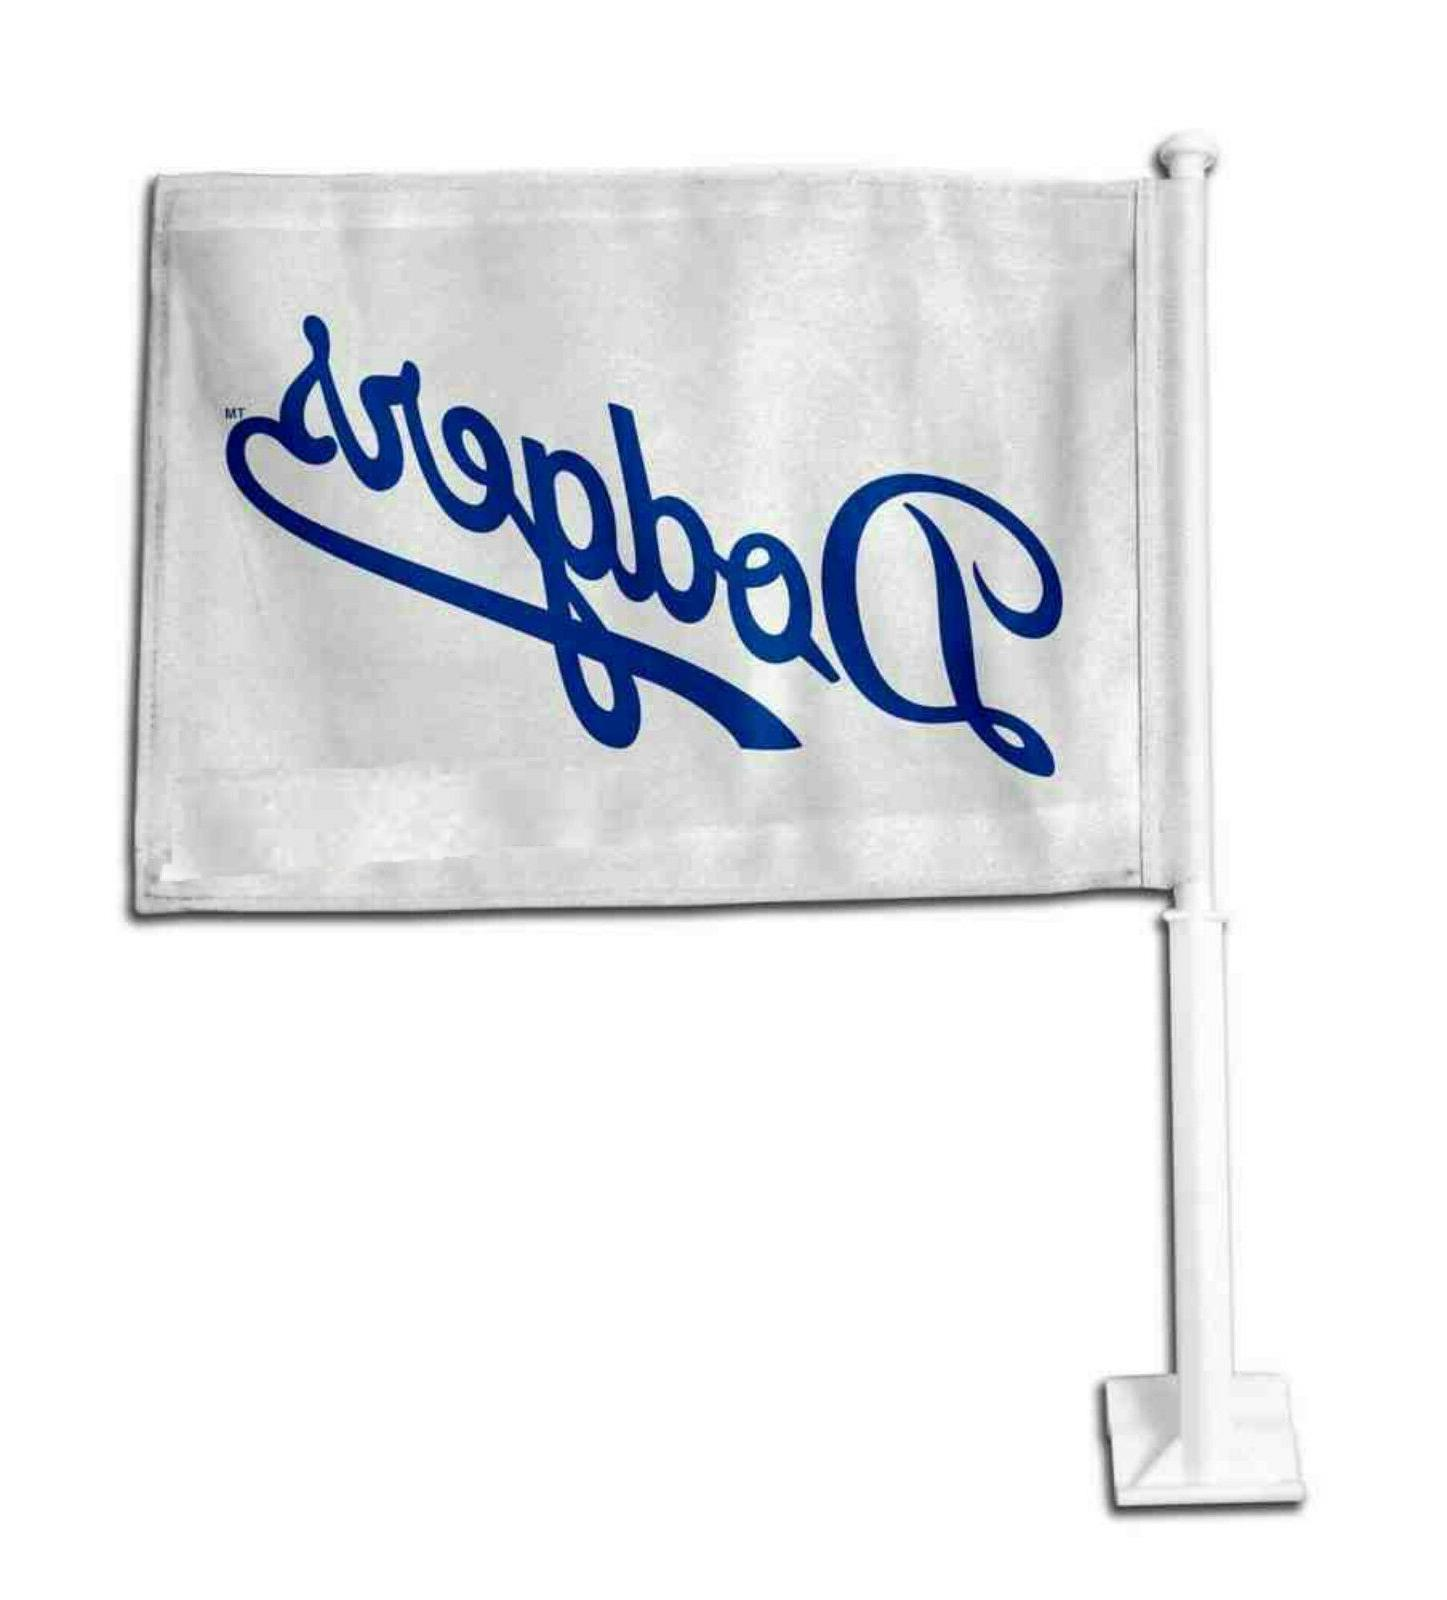 los angeles dodgers white car flag double